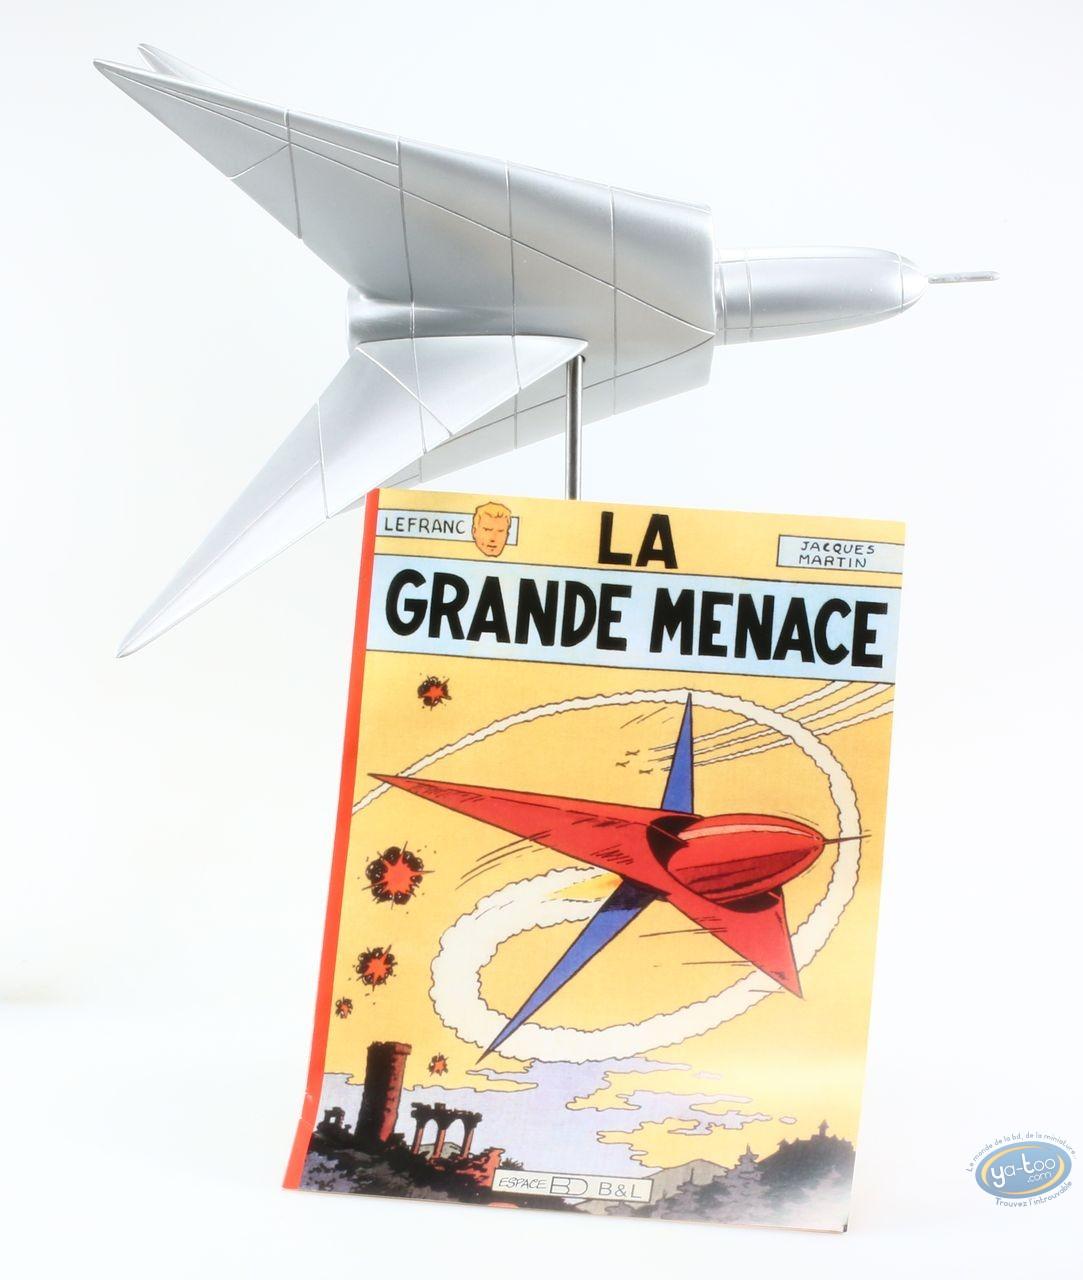 Resin Statuette, Lefranc : The big threat (monochrom)